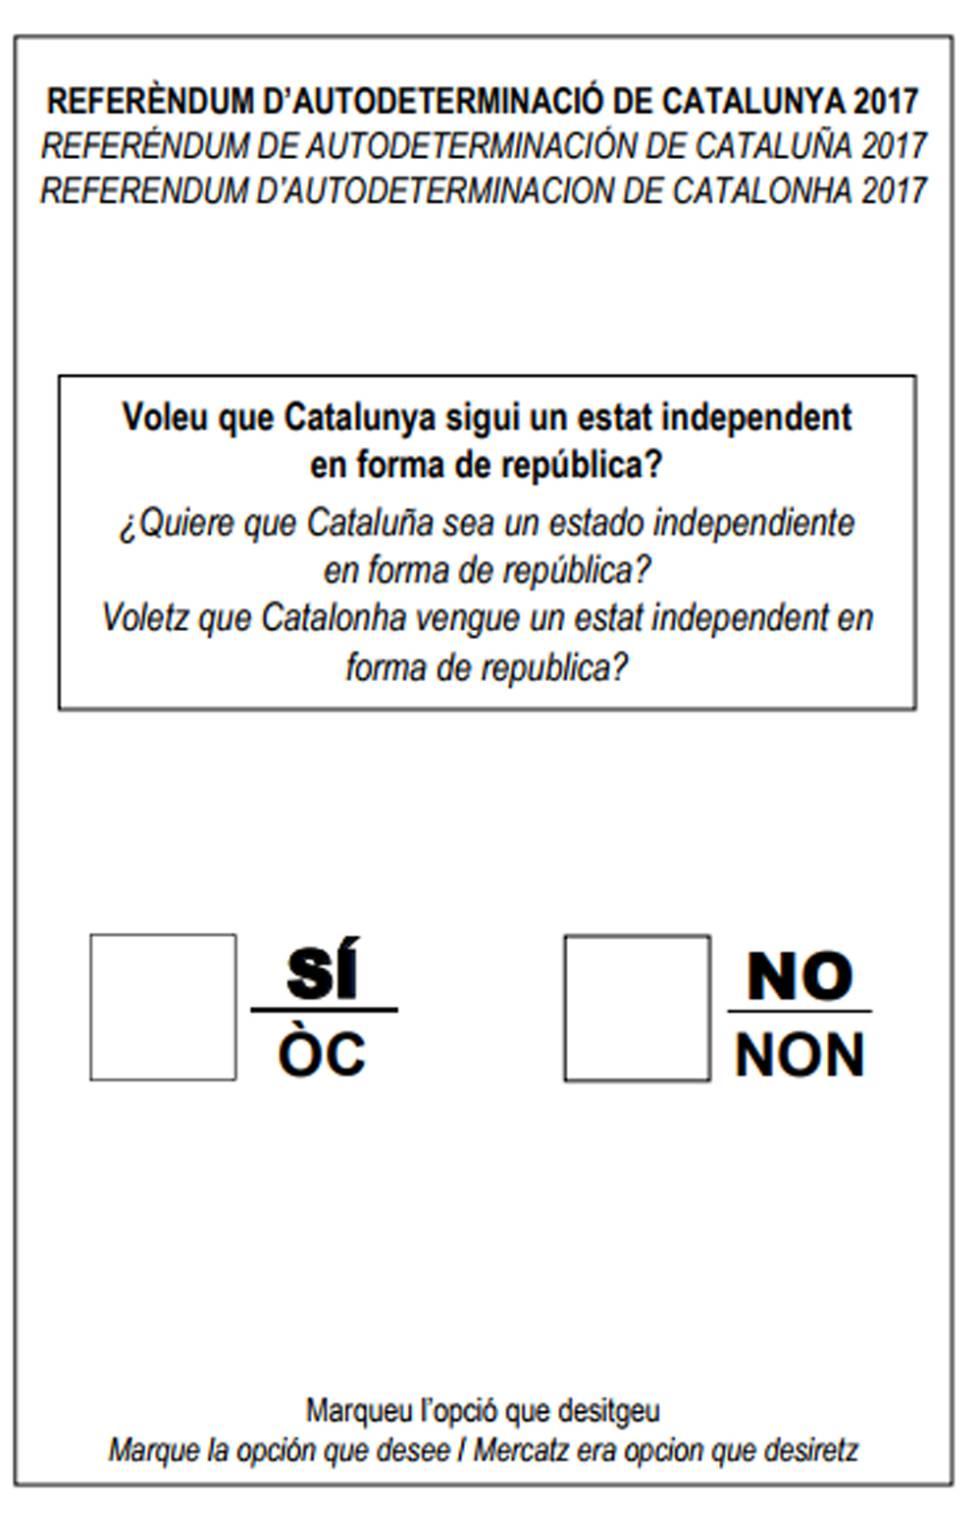 pepeleta-referendum-2017-1.jpg